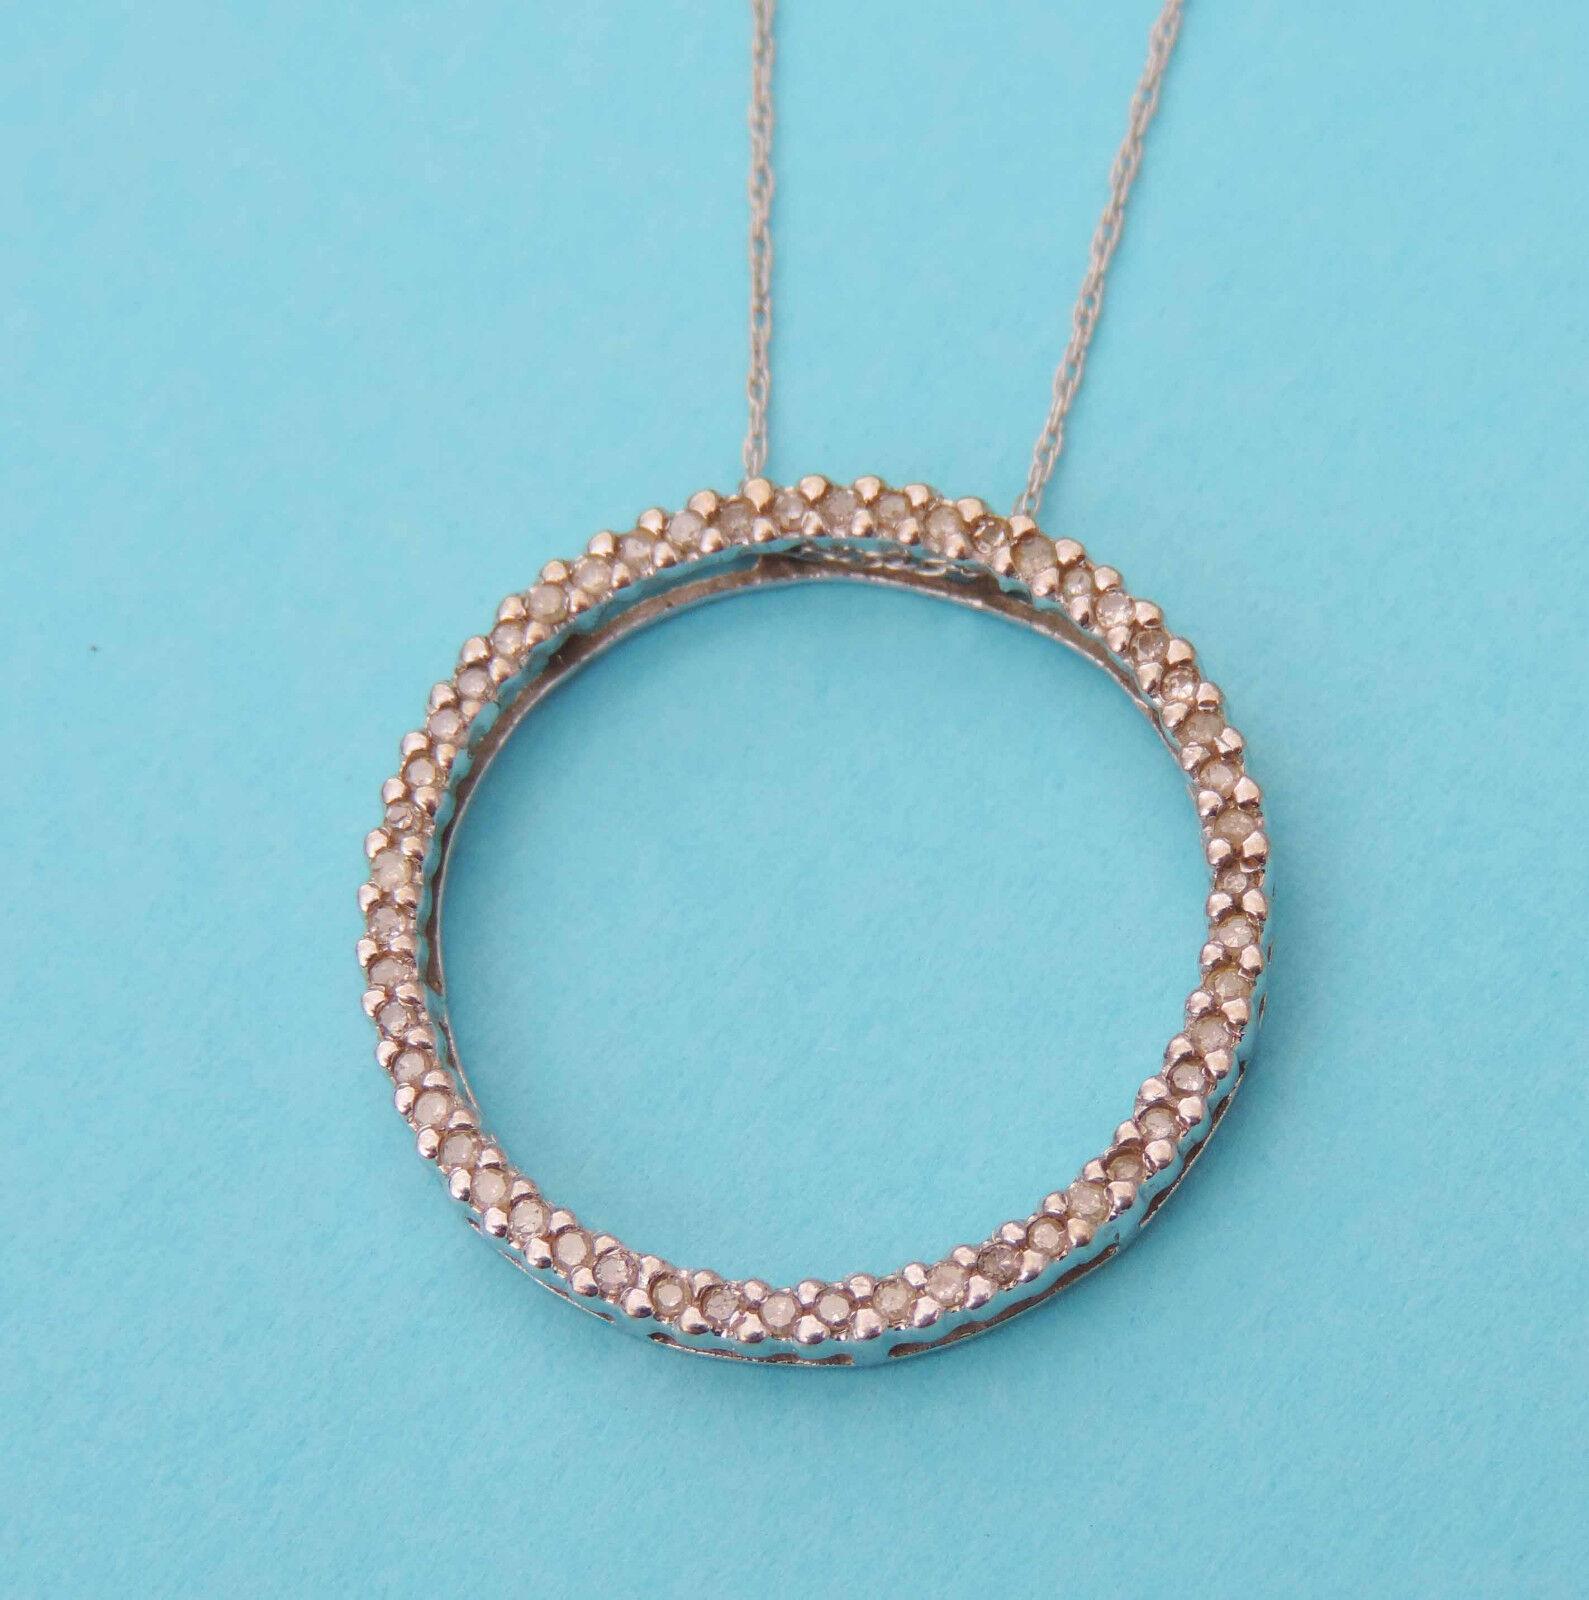 Ladies Circle Pendant w  50 Genuine Diamonds - 10k White gold - 18 Inch Chain